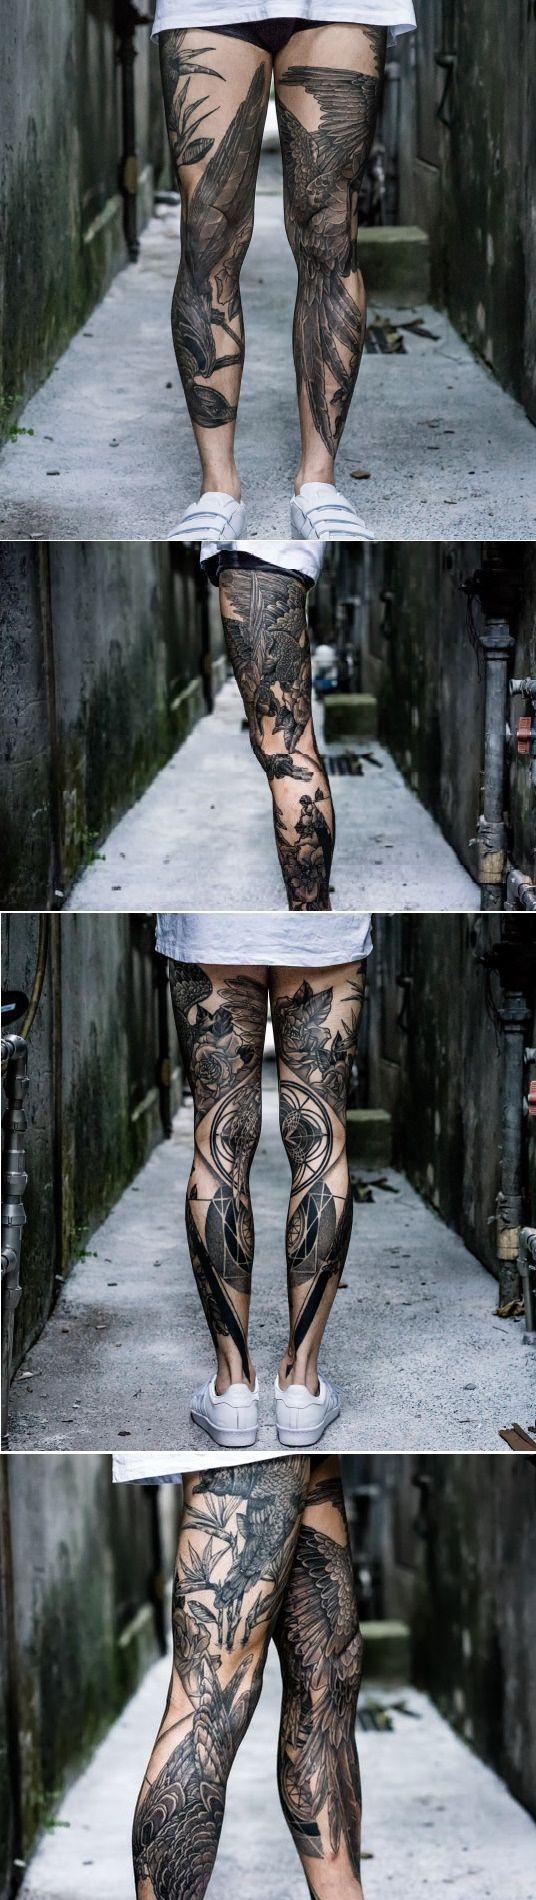 Amazing Leg Tattoo Ideas For Girls Trending 2017